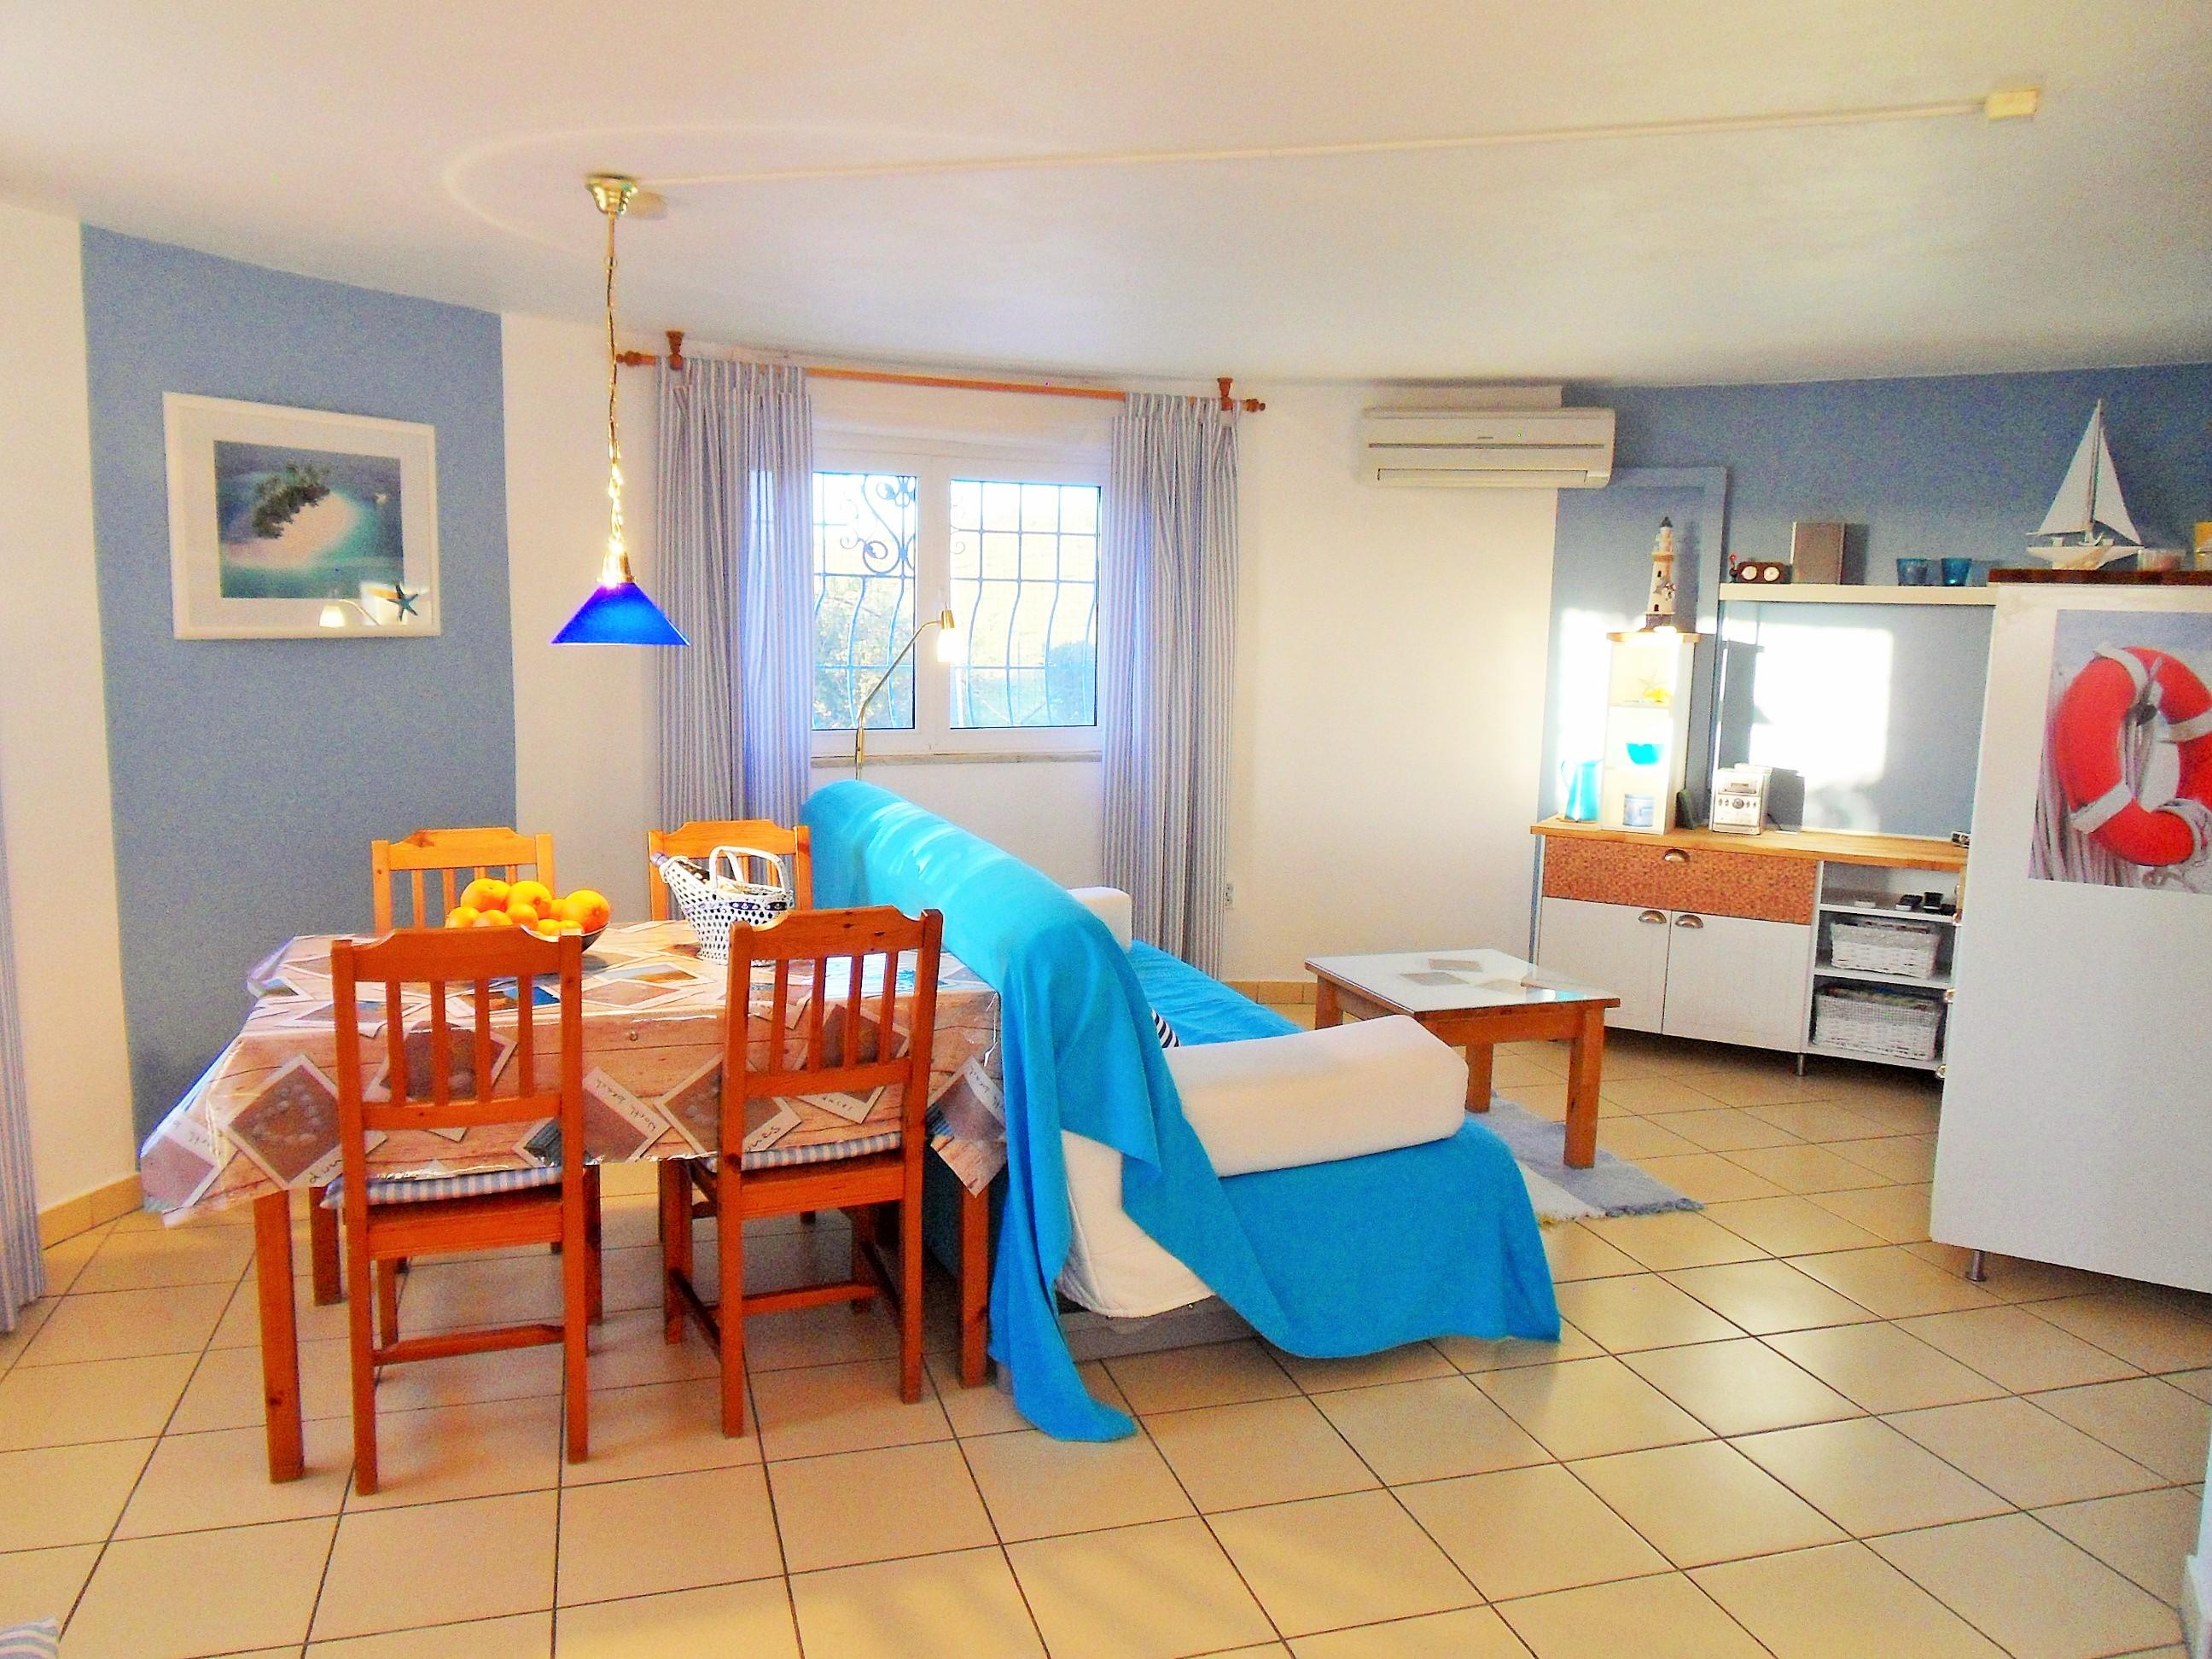 Holiday apartments and villas for rent, Apartment Sétimo Céu (Seventh Heaven) in Castro Marim, Portugal Algarve, REF_IMG_9017_9018